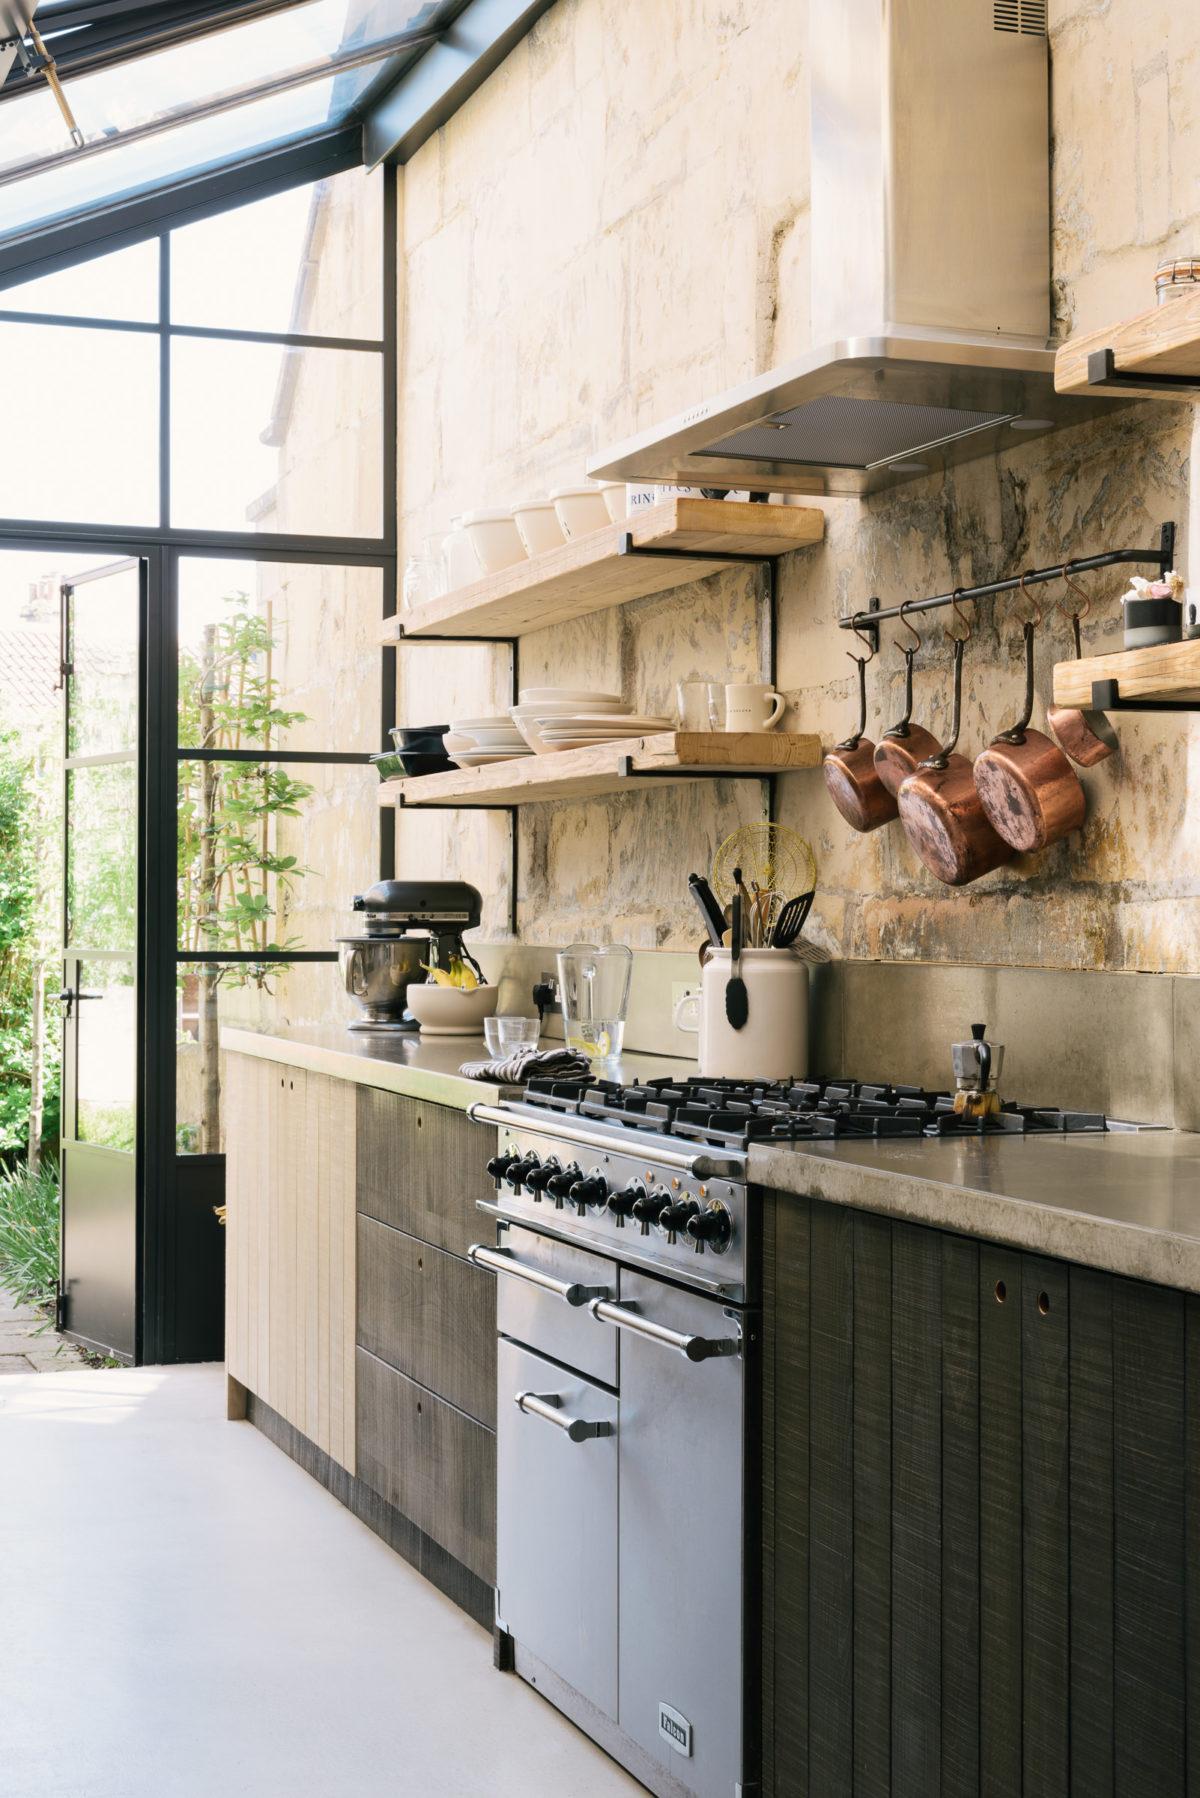 We Won Kitchen Design Of The Year The Devol Journal